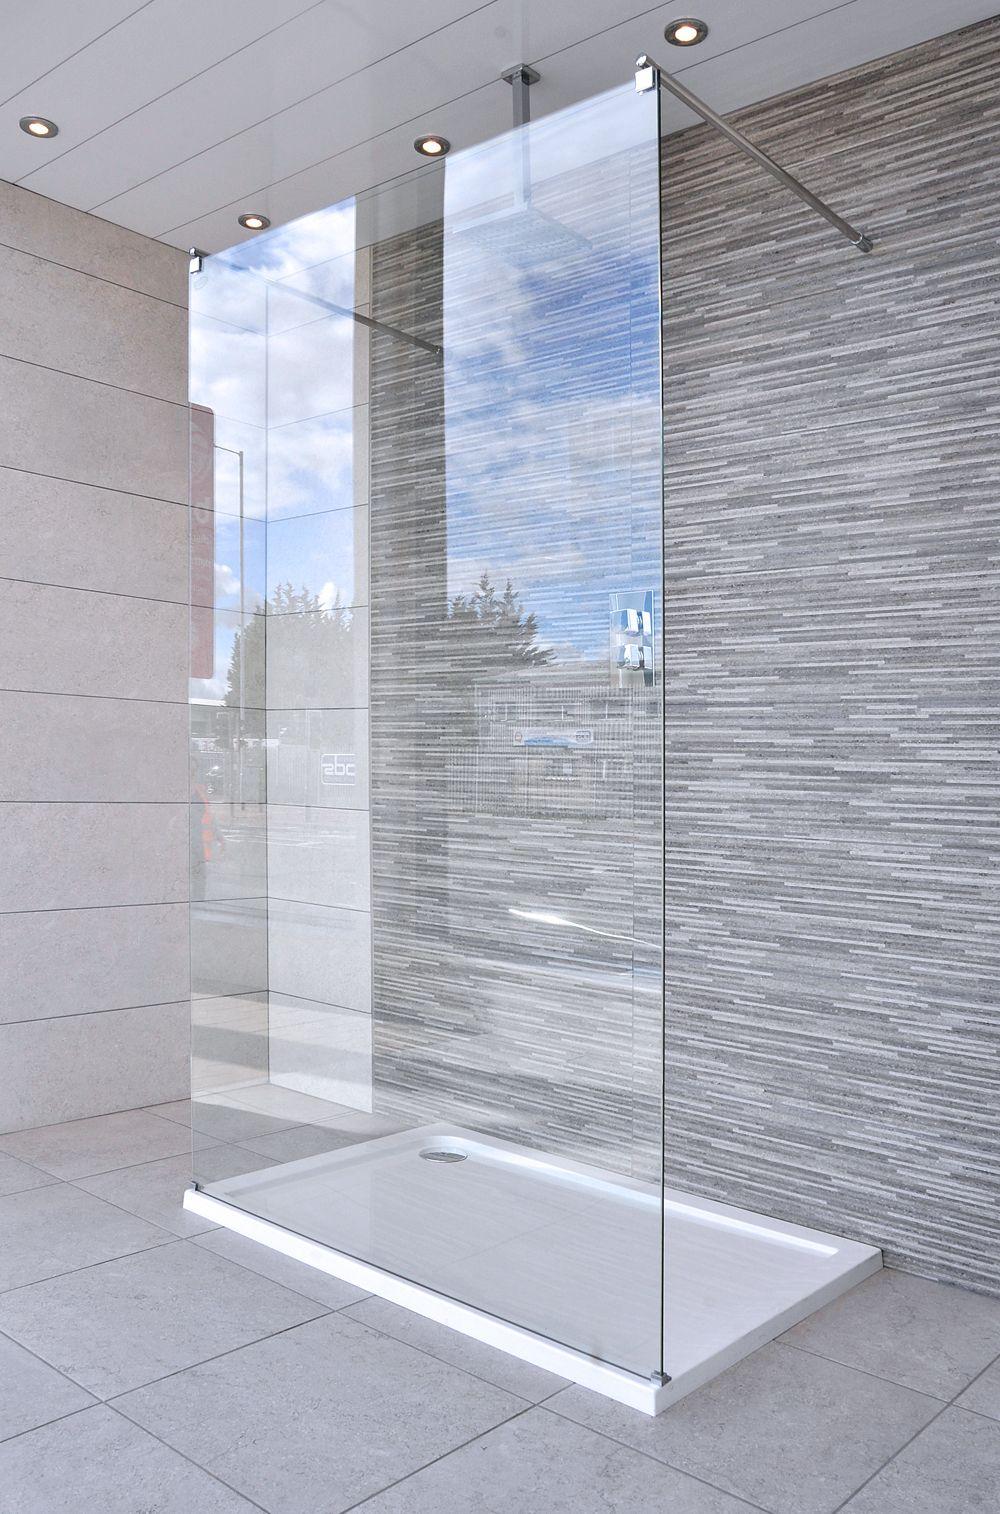 guocera ceramic wall tiles uk. concrete noce 28x85cm decor wall tile by baldocer | brooke ceramics guocera ceramic tiles uk